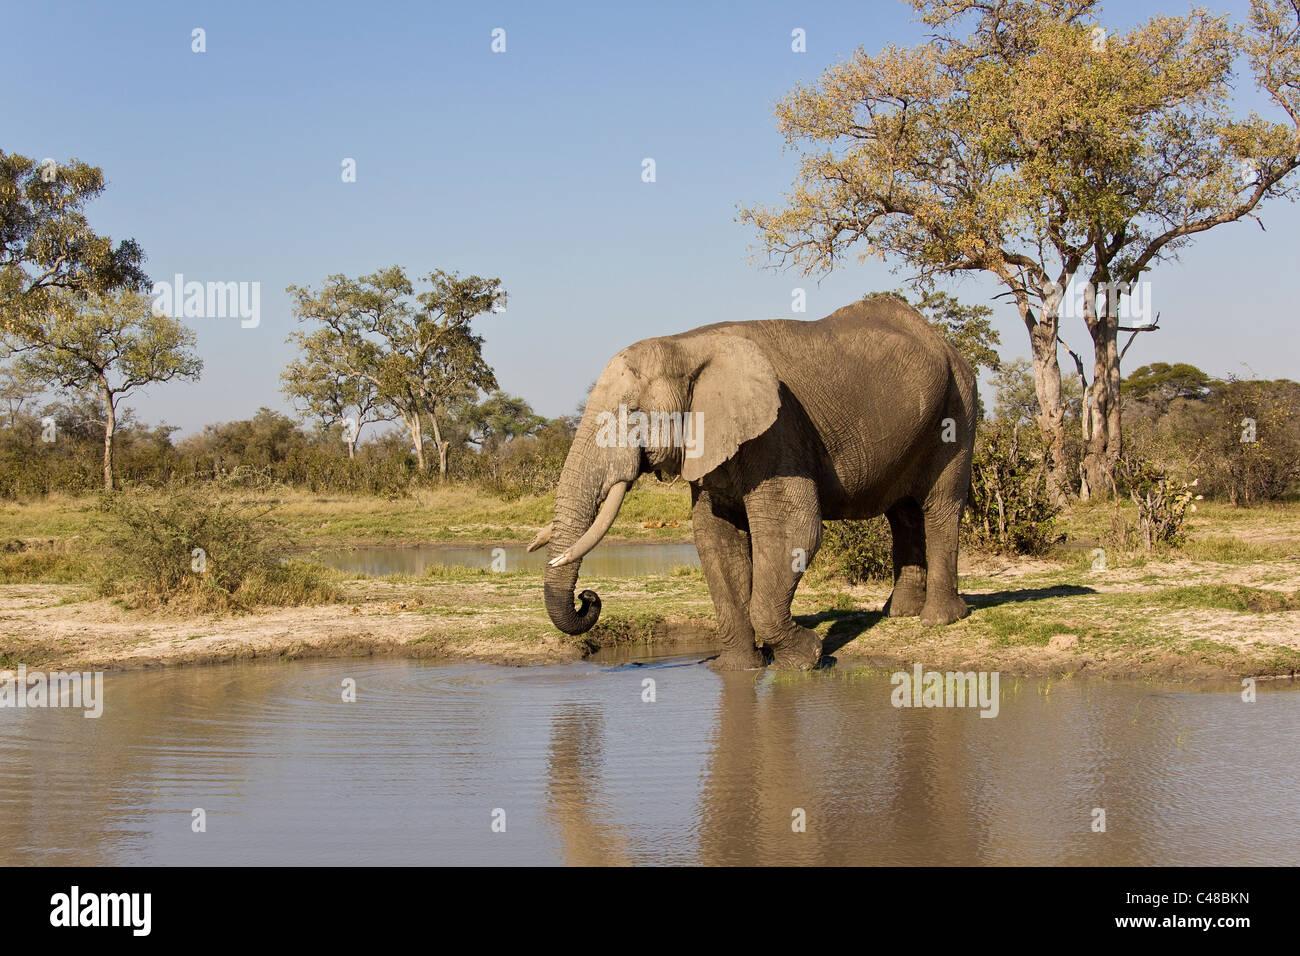 Afrikanischer Elefant (Loxodonta africana) am natürlichen Wasserloch, Savuti, Botswana, Afrika Stock Photo